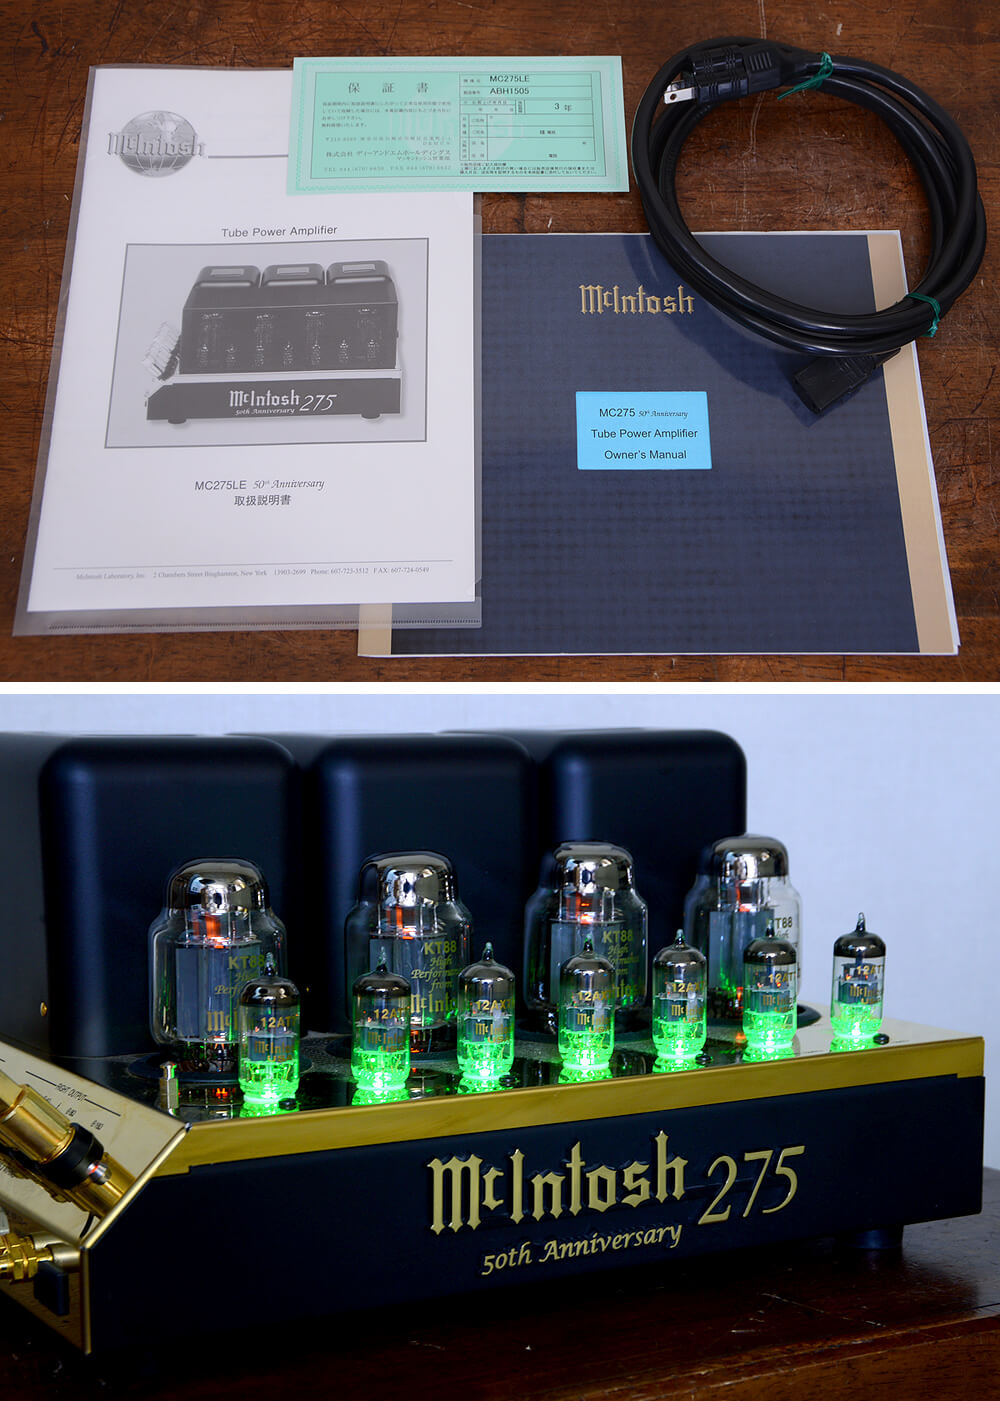 McIntosh MC275LE 真空管パワーアンプ 50周年記念限定モデル3枚目